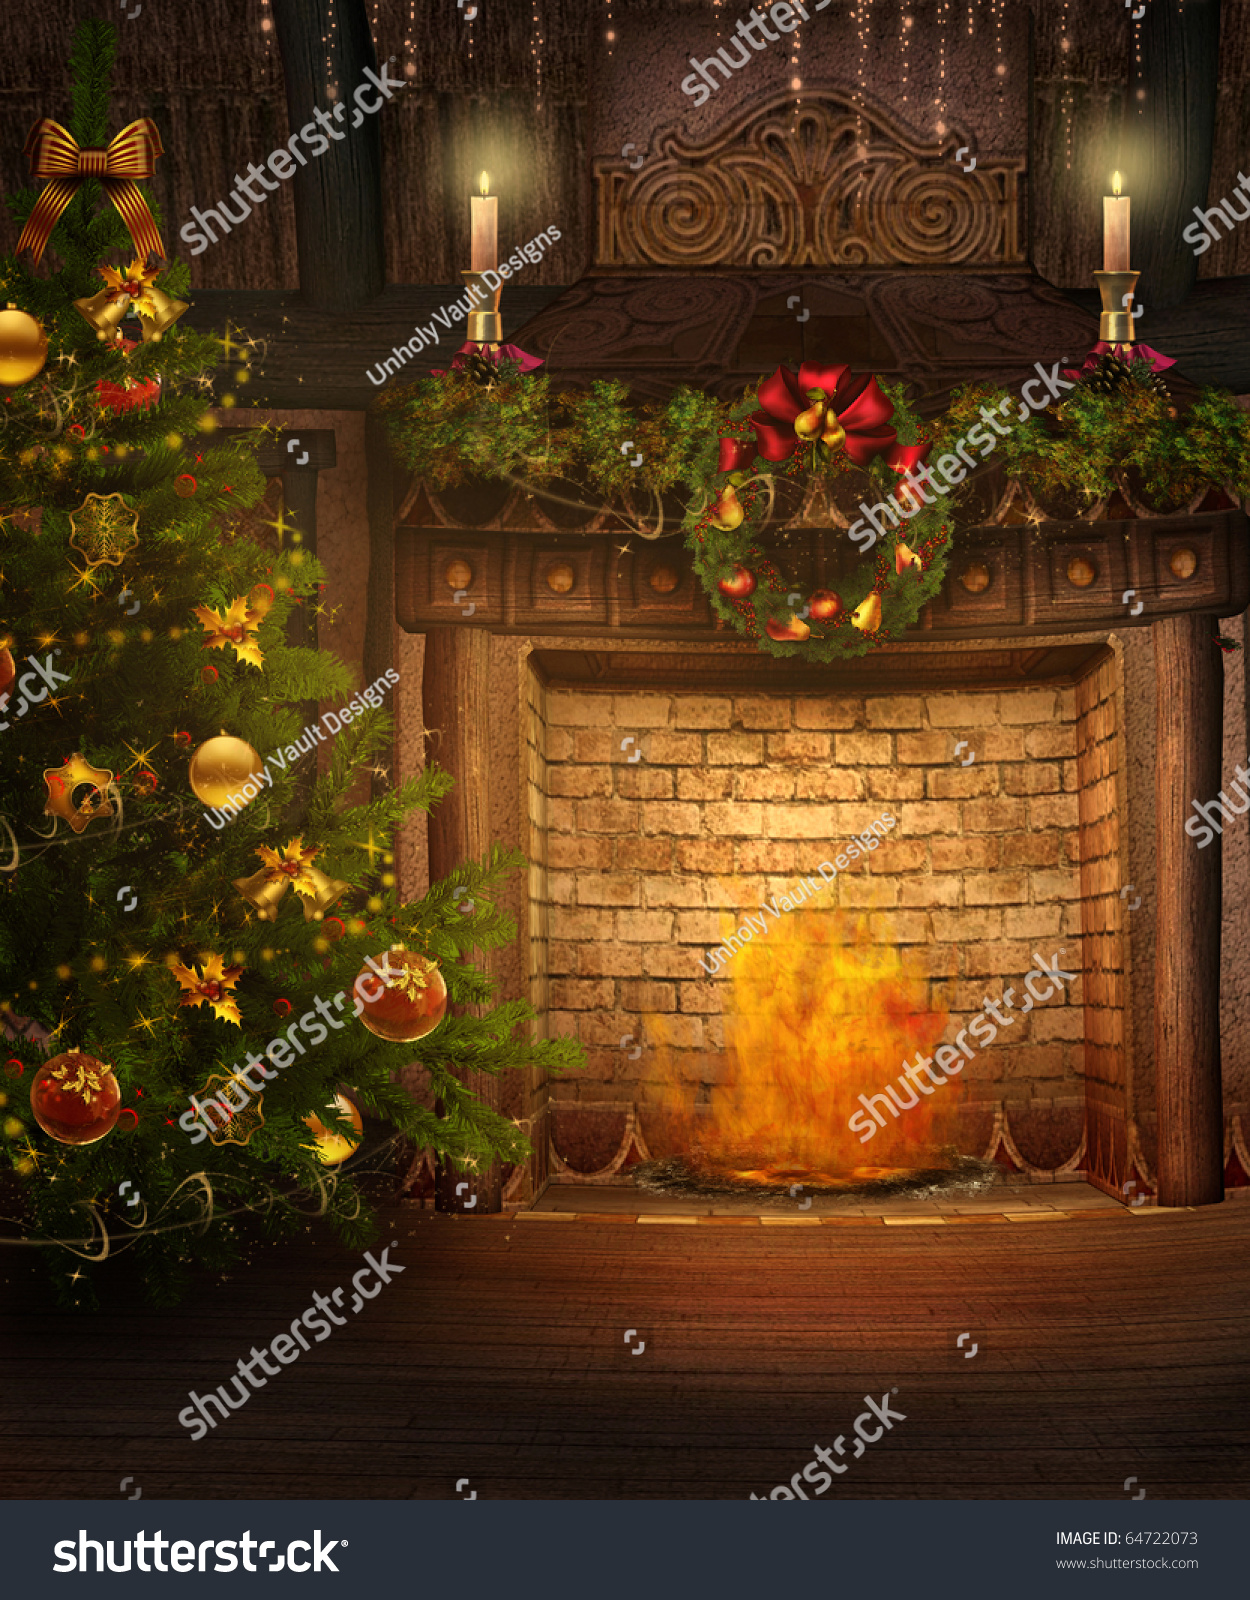 fantasy room christmas tree fireplace stock illustration 64722073